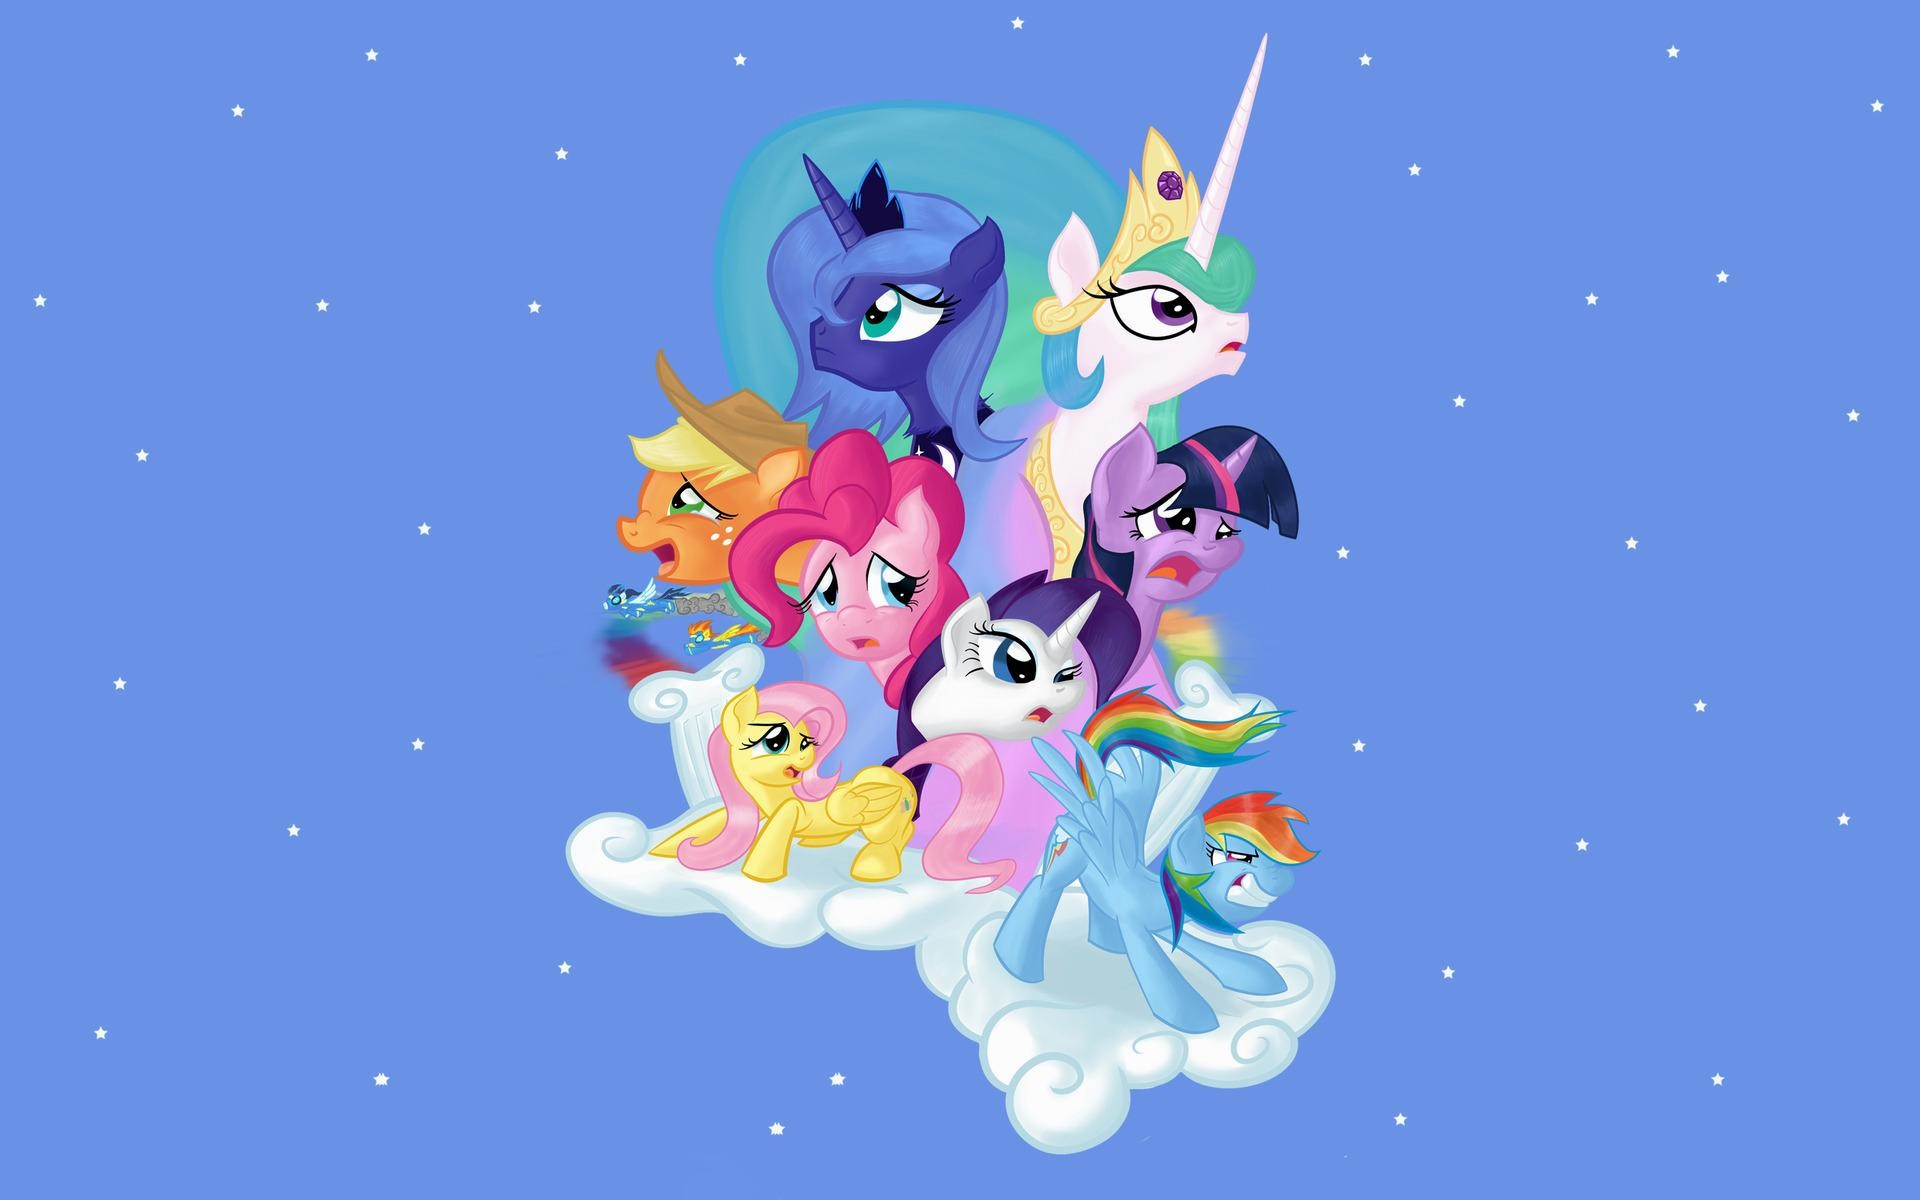 My-little-pony-rainbow-dash-princess-wallpaper-hd